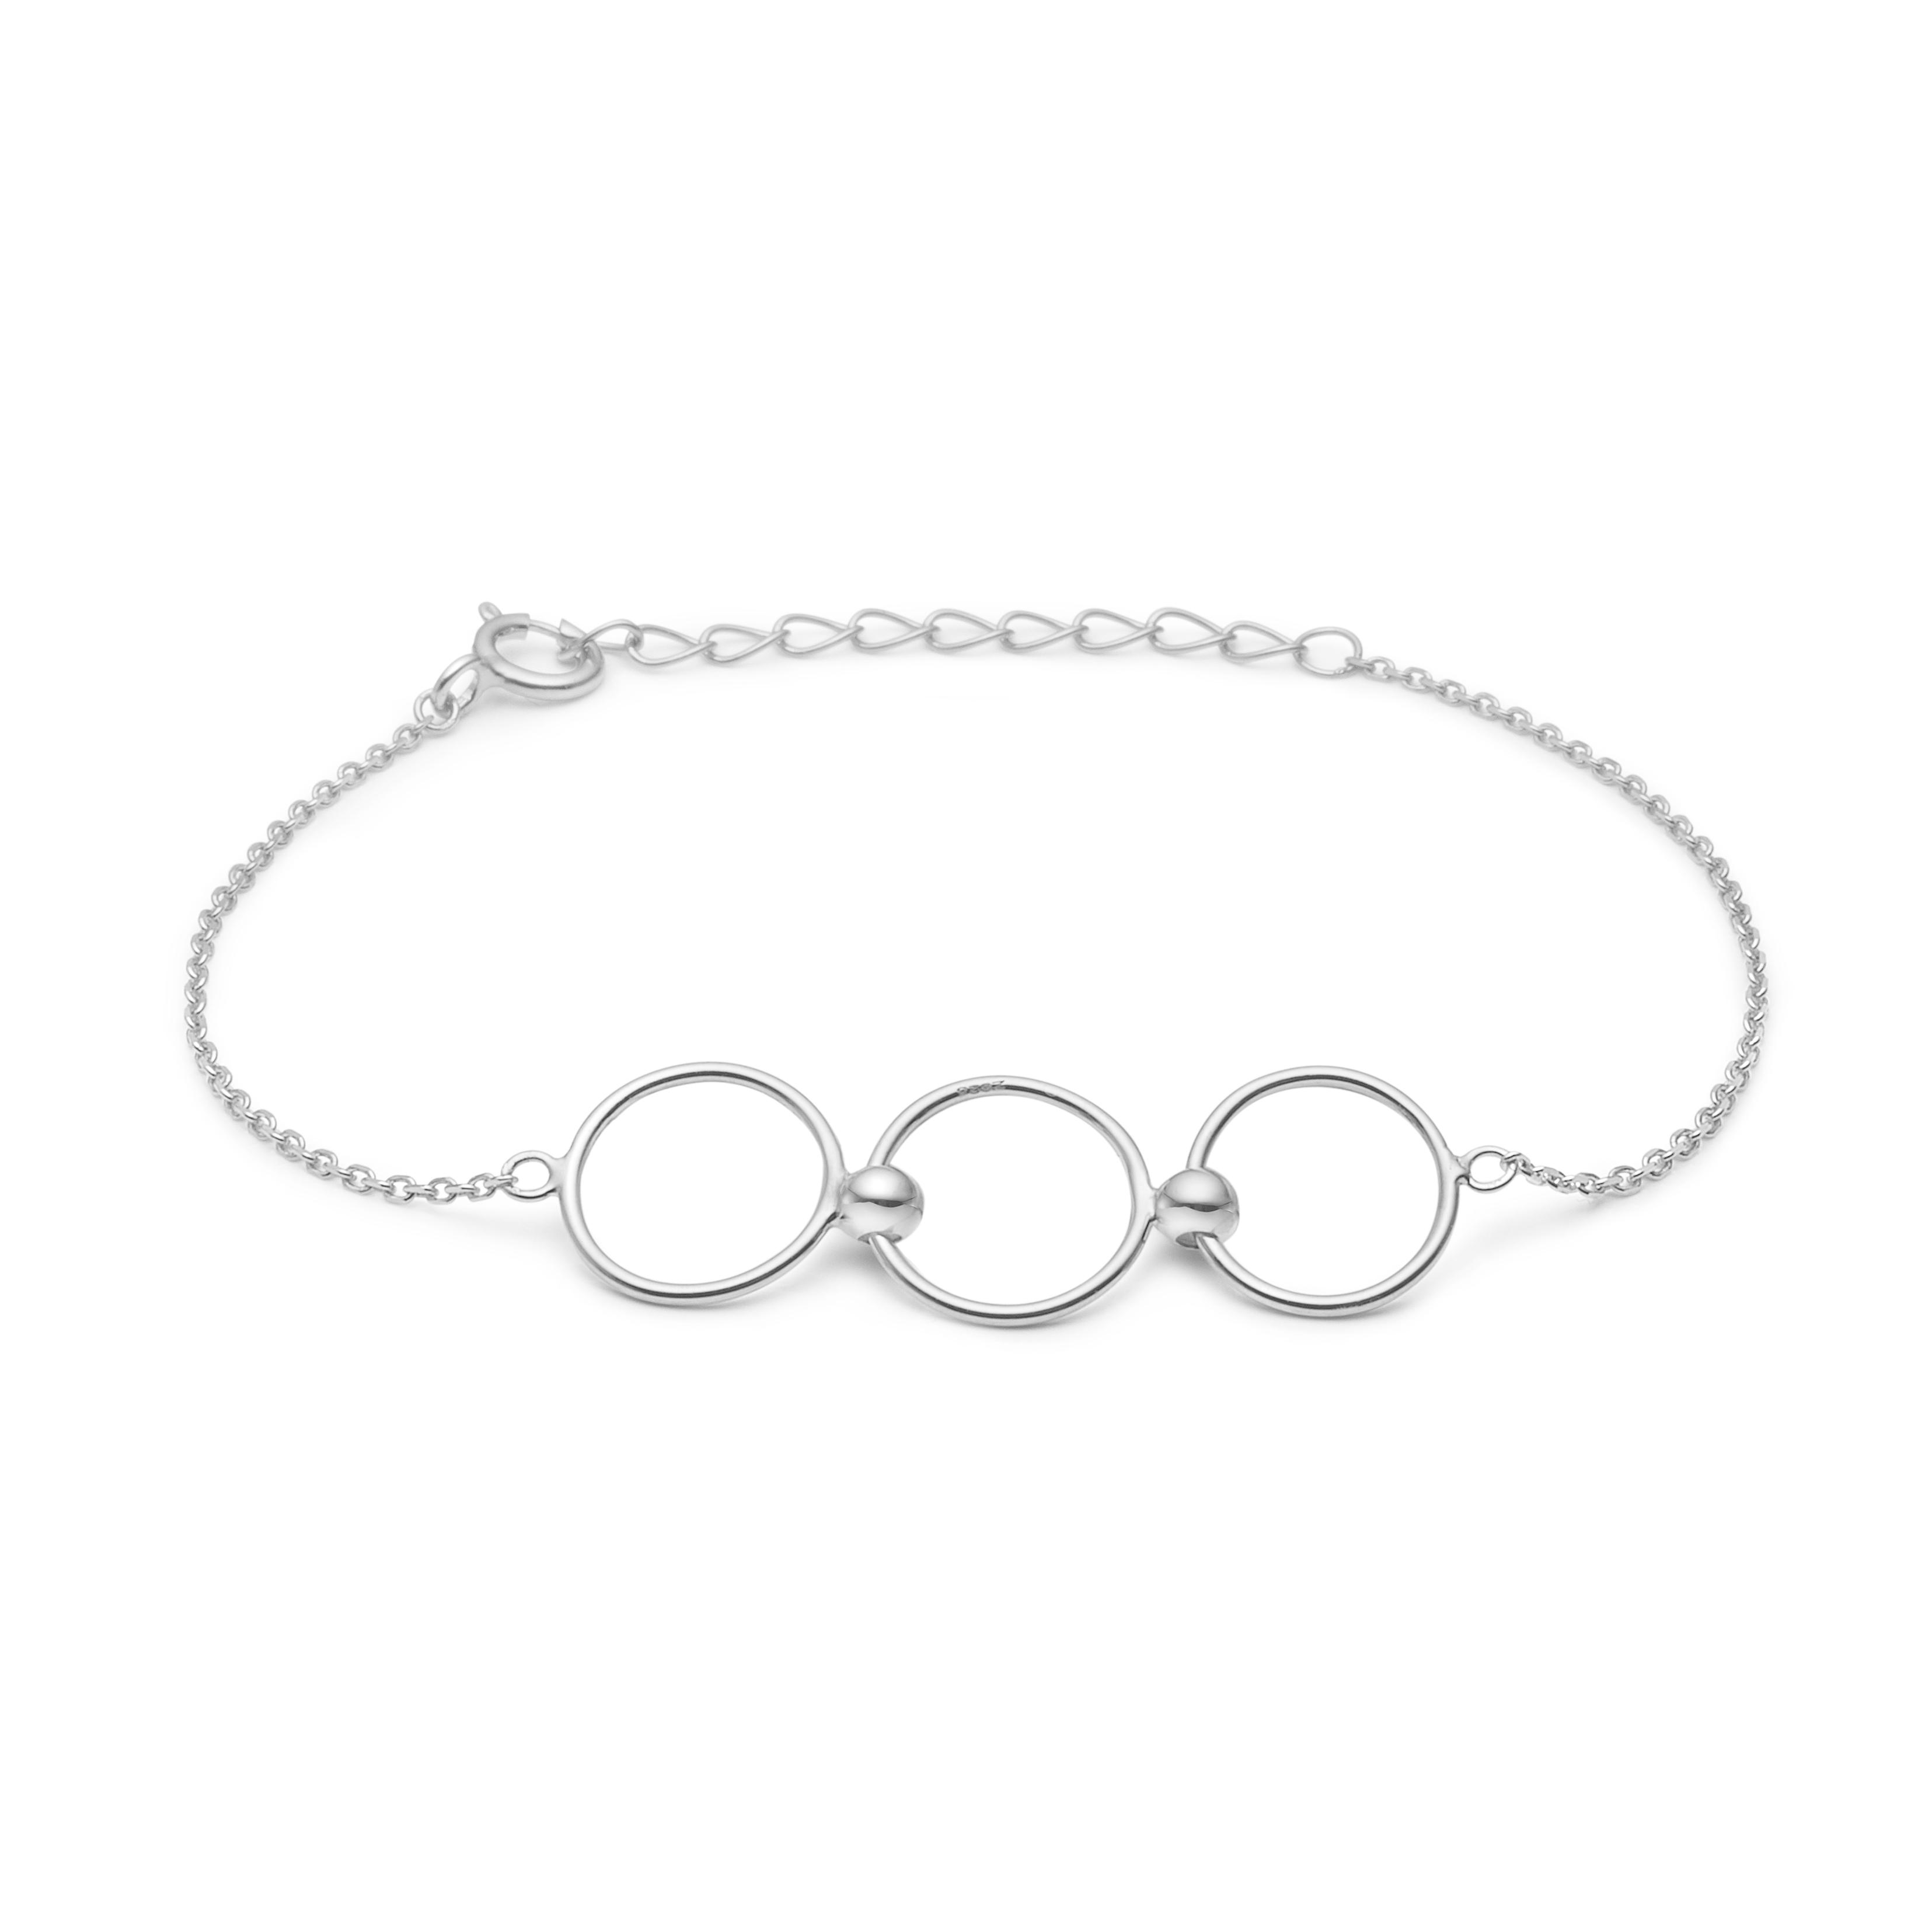 mads ziegler Sølv armbånd olympic - 3150135 på Edgy.dk